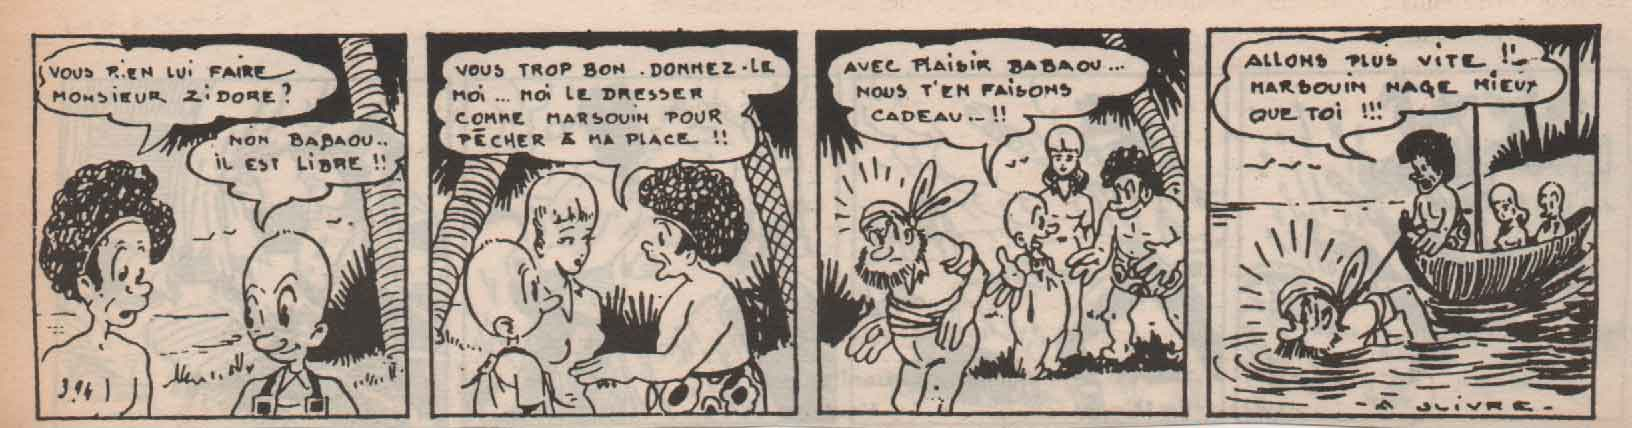 « Zidore » Le Patriote (1947).